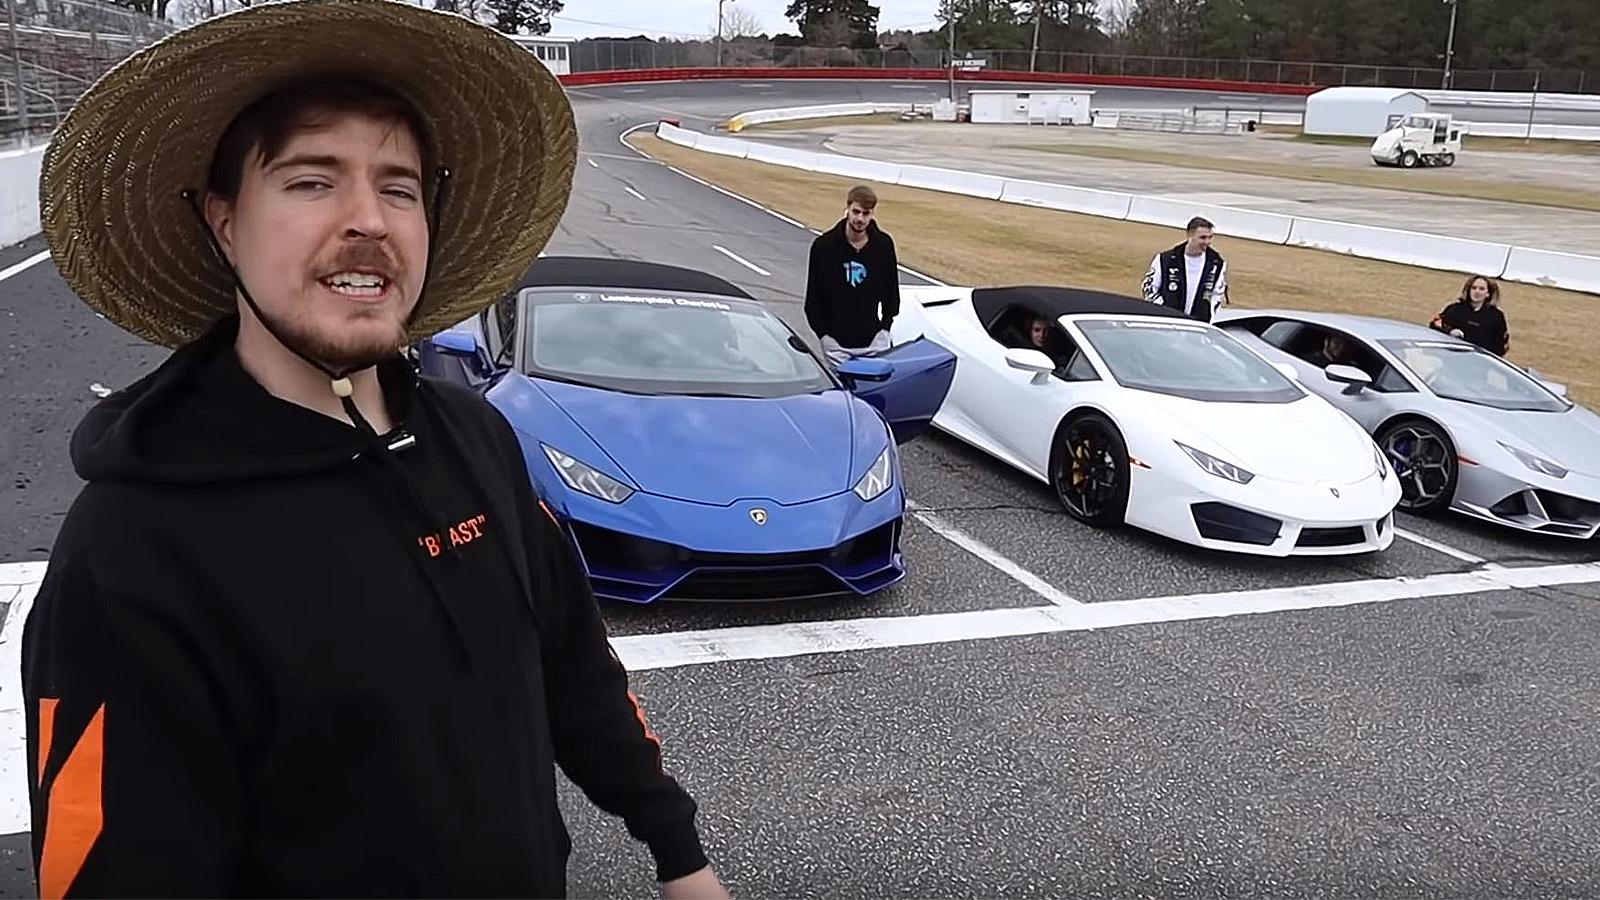 MrBeast Lamborghini challenge.